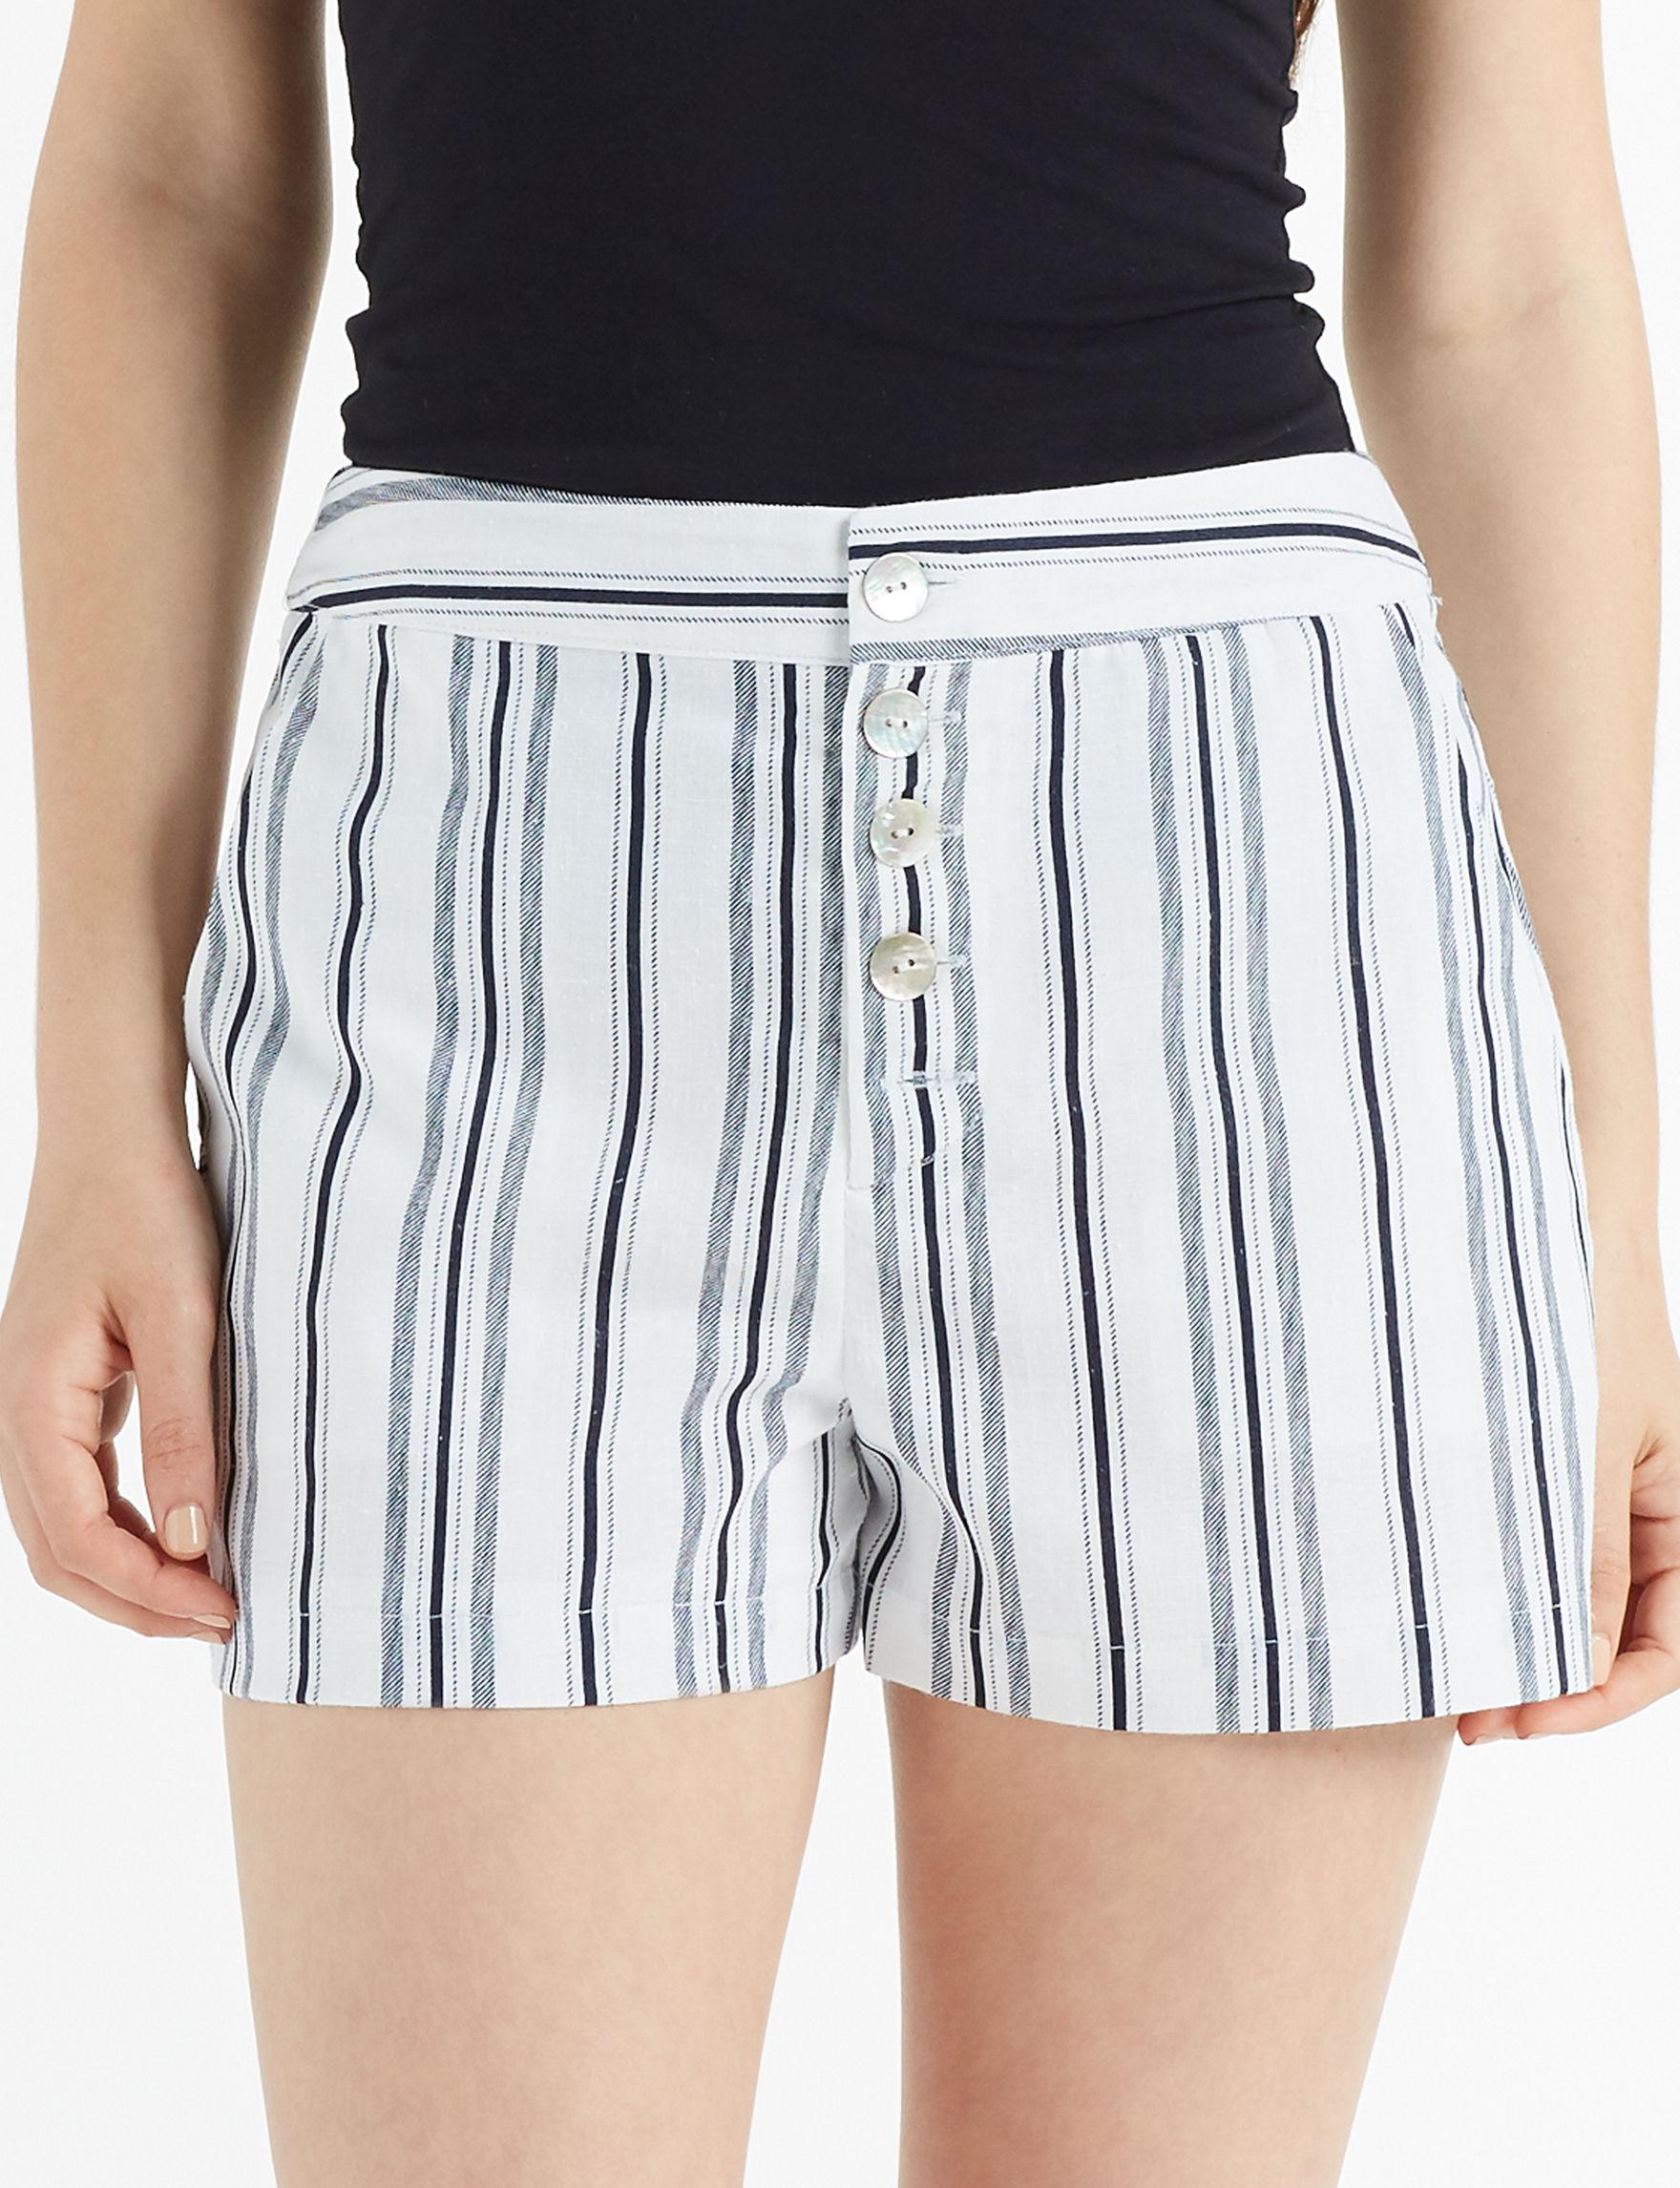 Charmed Hearts White Soft Shorts